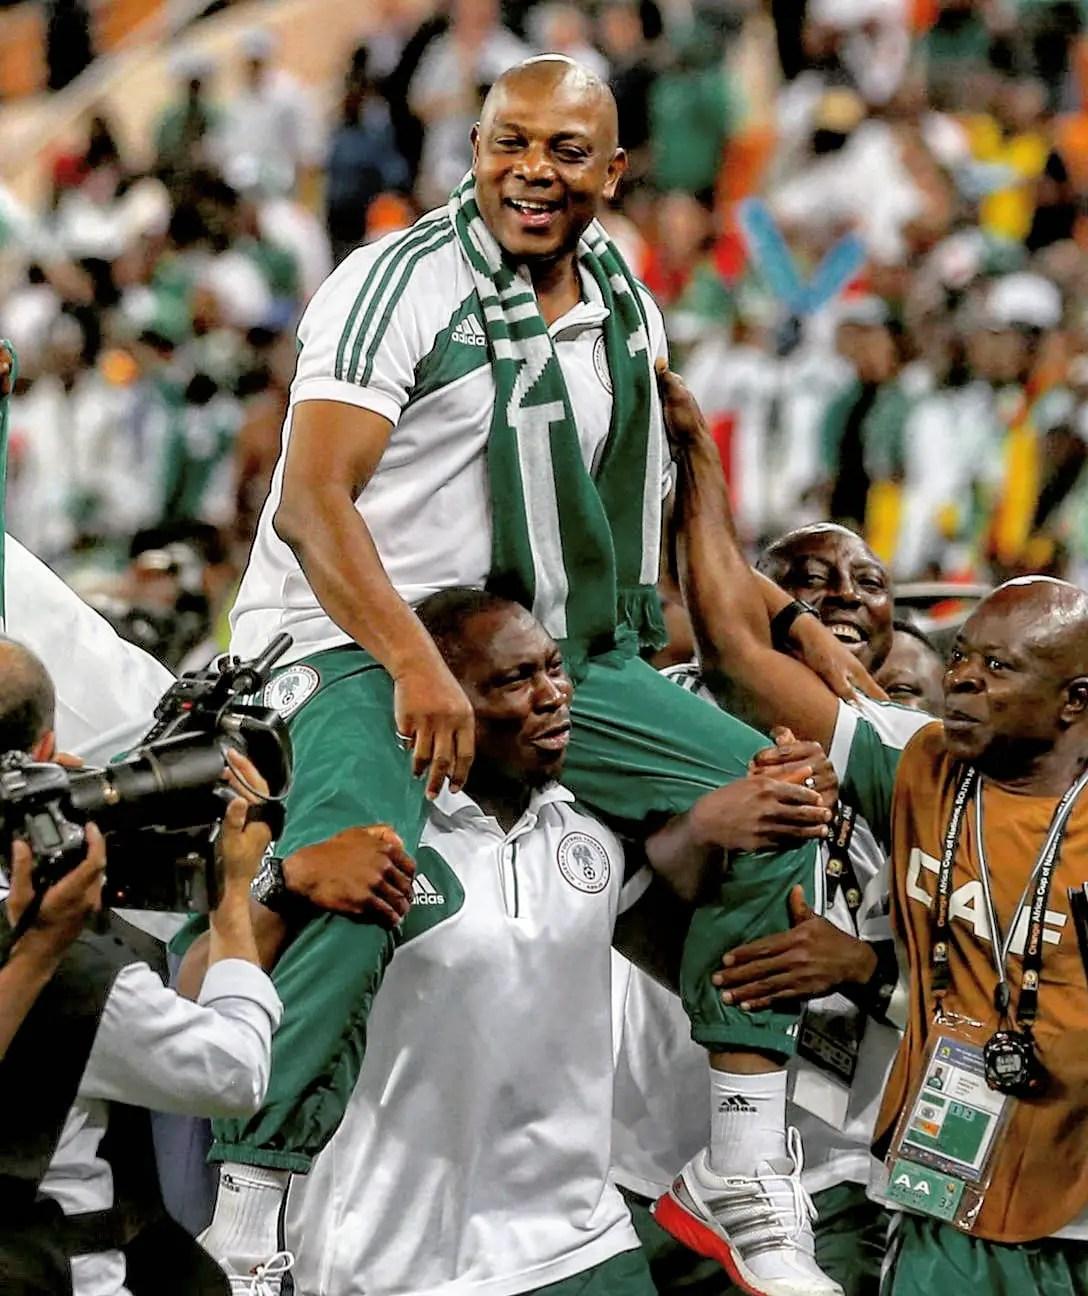 Yobo, CAF Pay Tribute To Late Keshi